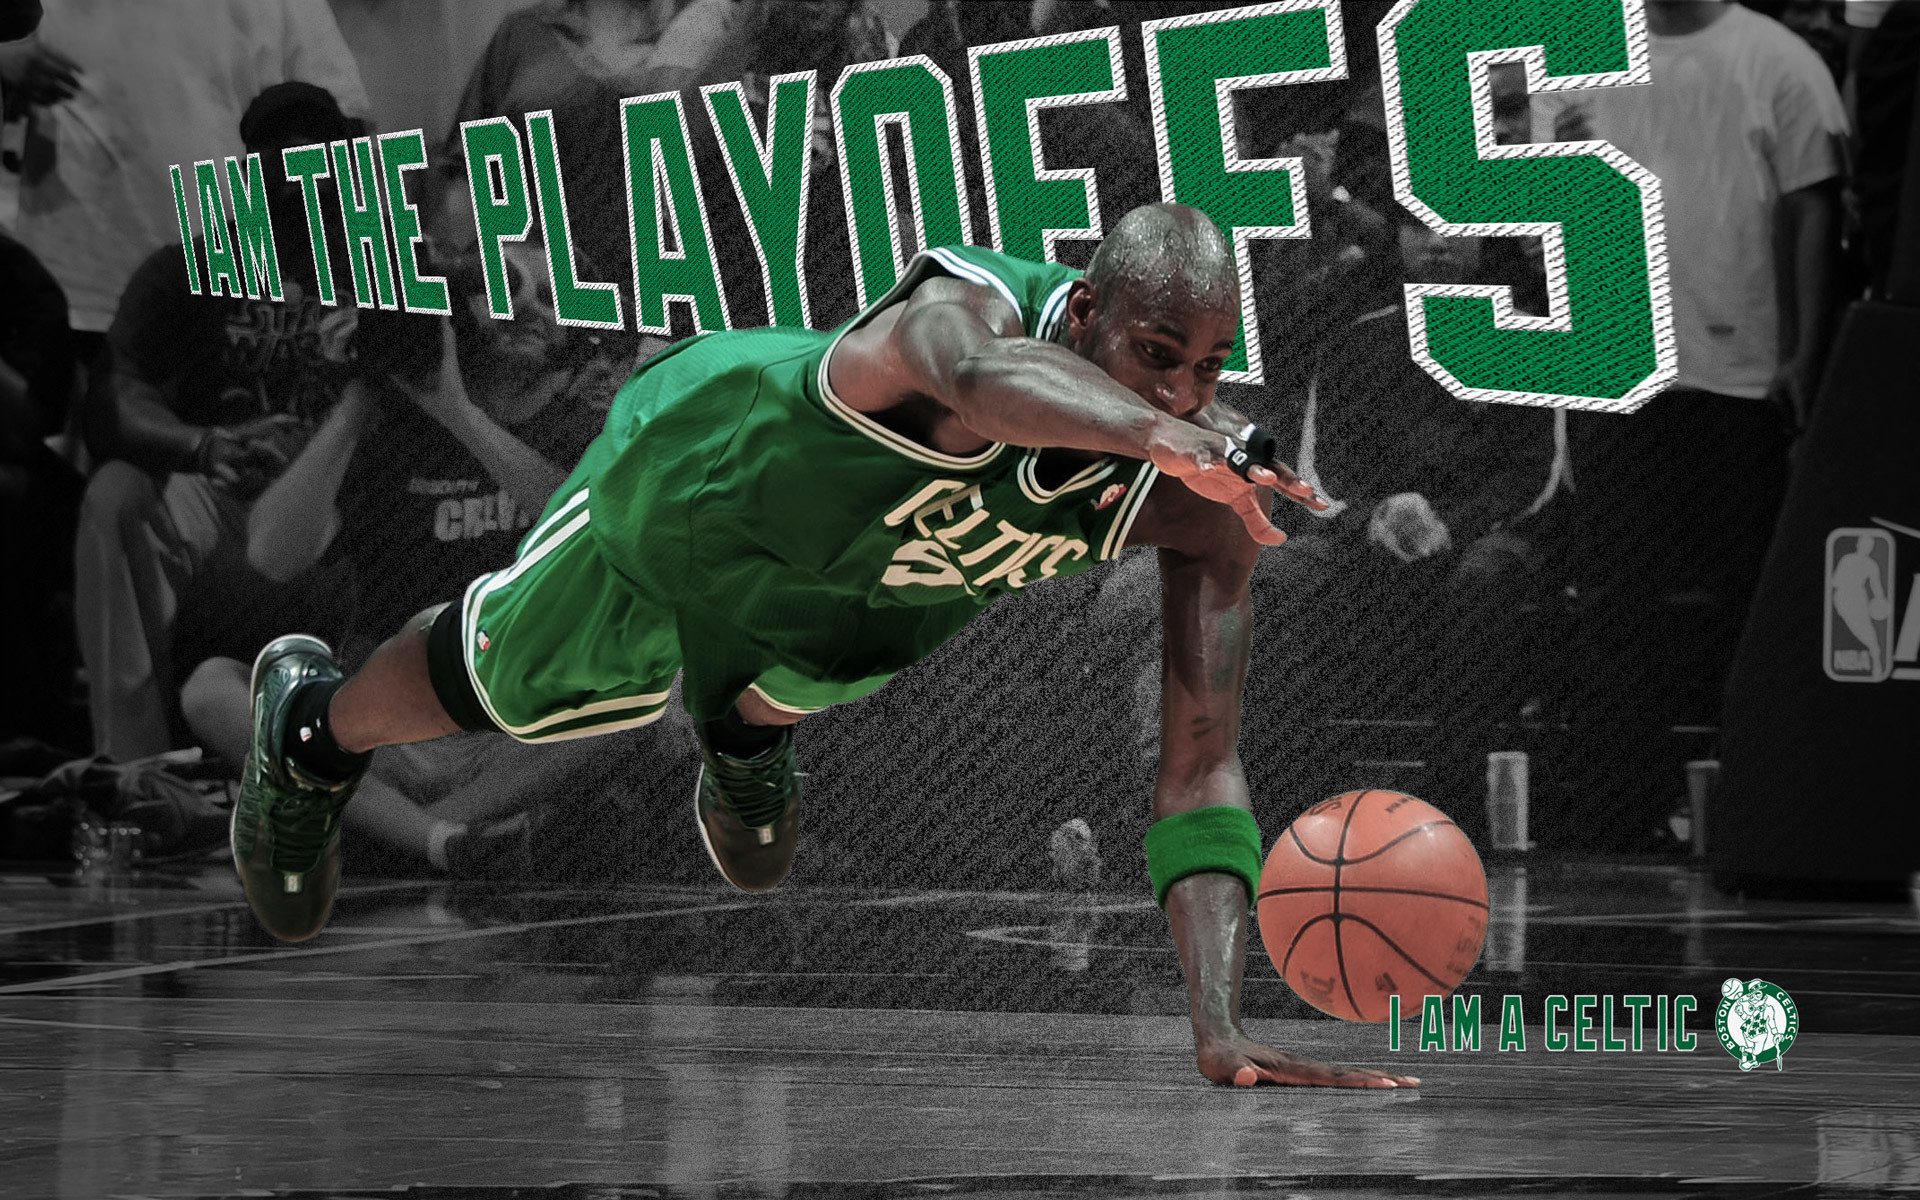 Boston Celtics Wallpapers and Screensavers